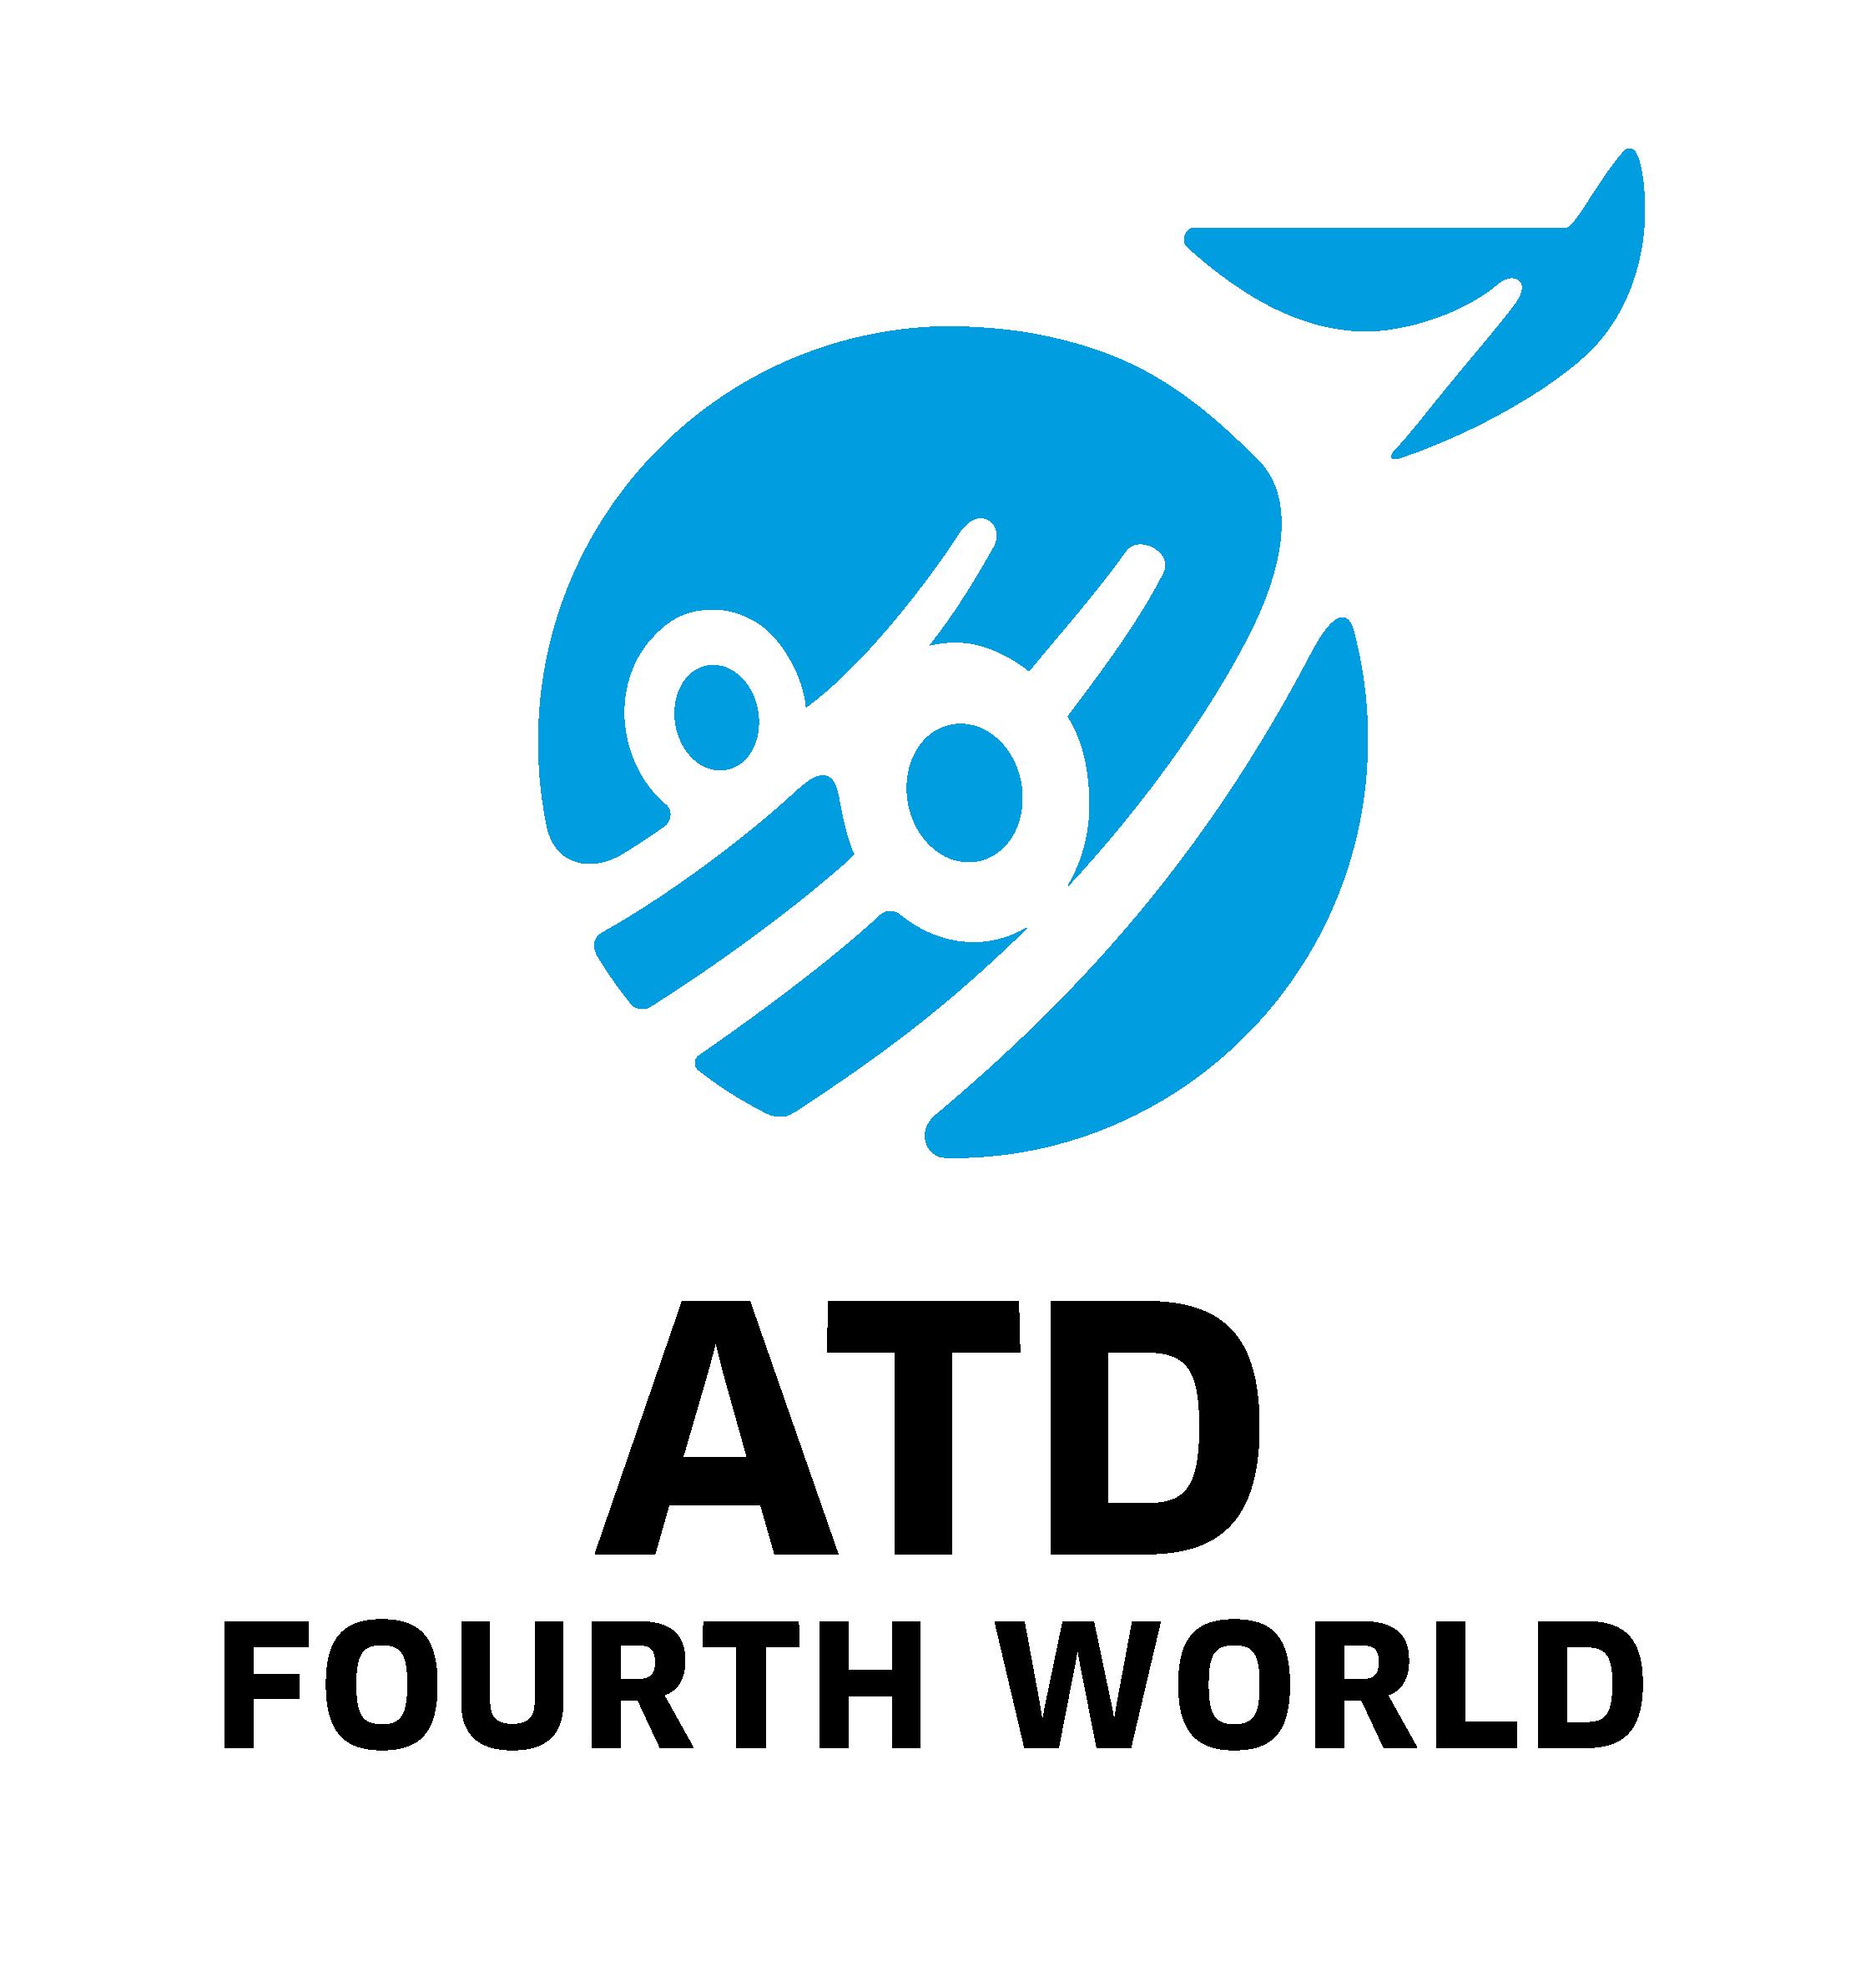 ATD Fourth World